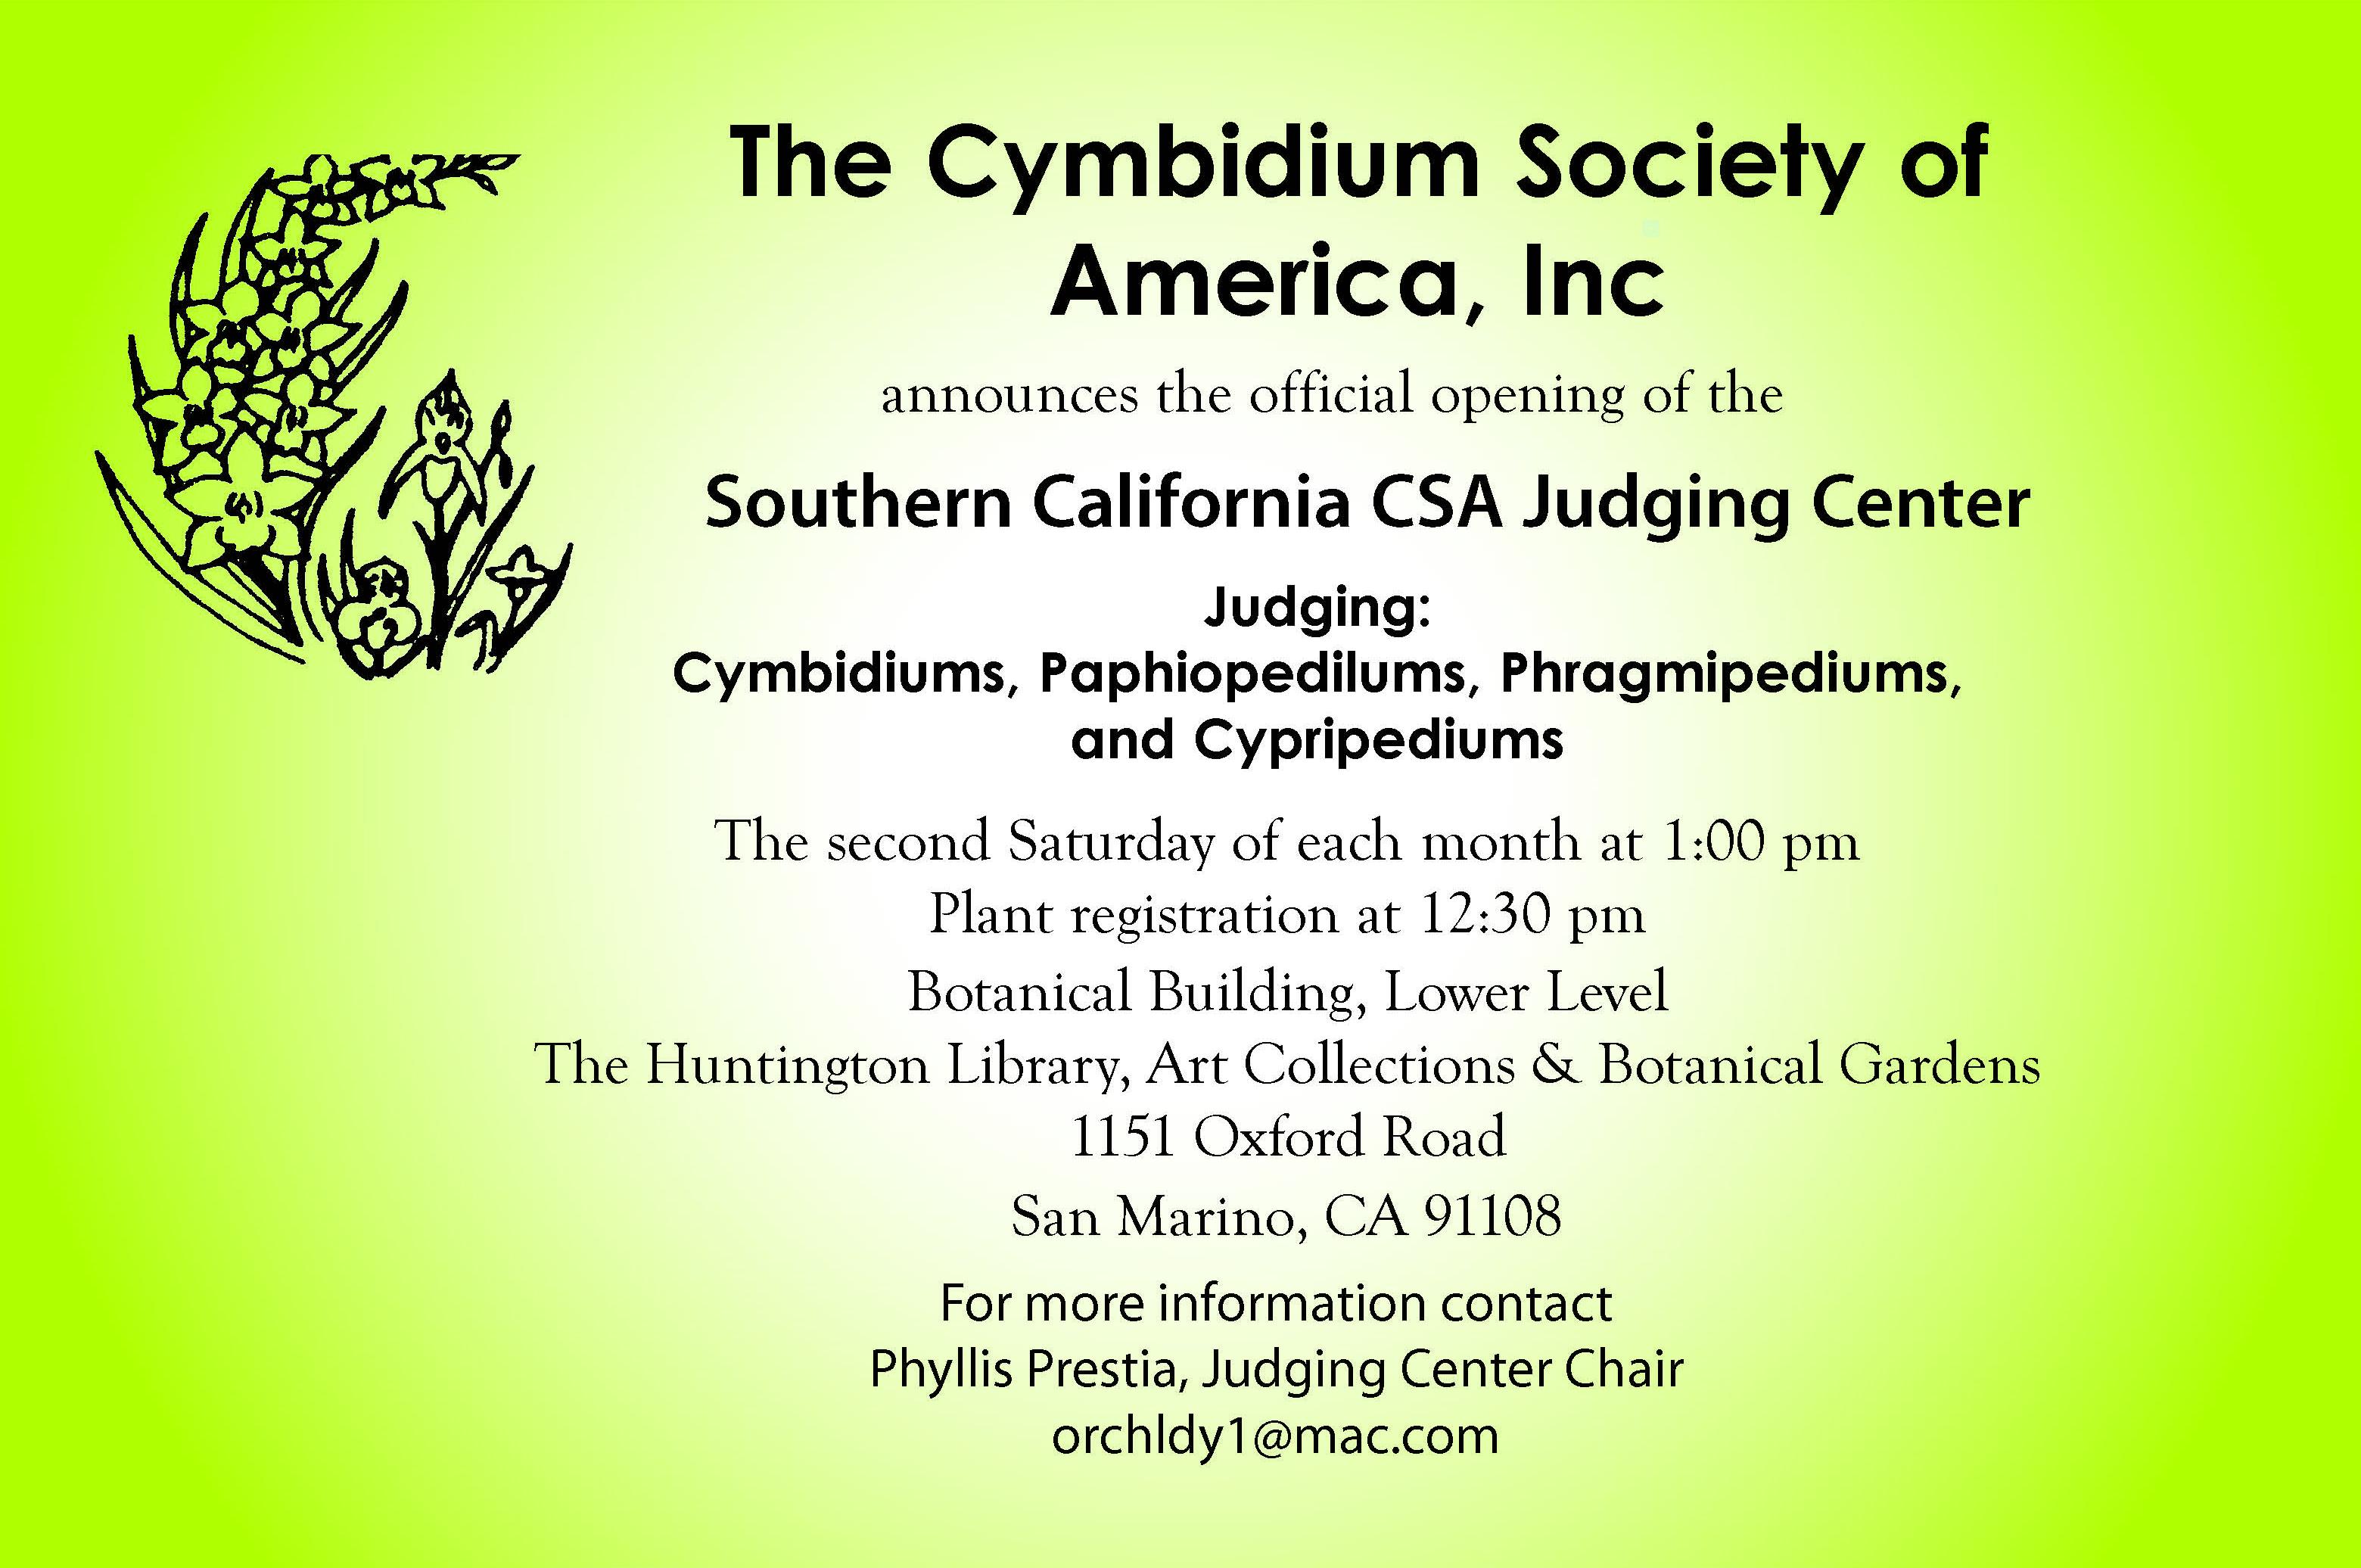 CSA-Judging-Center